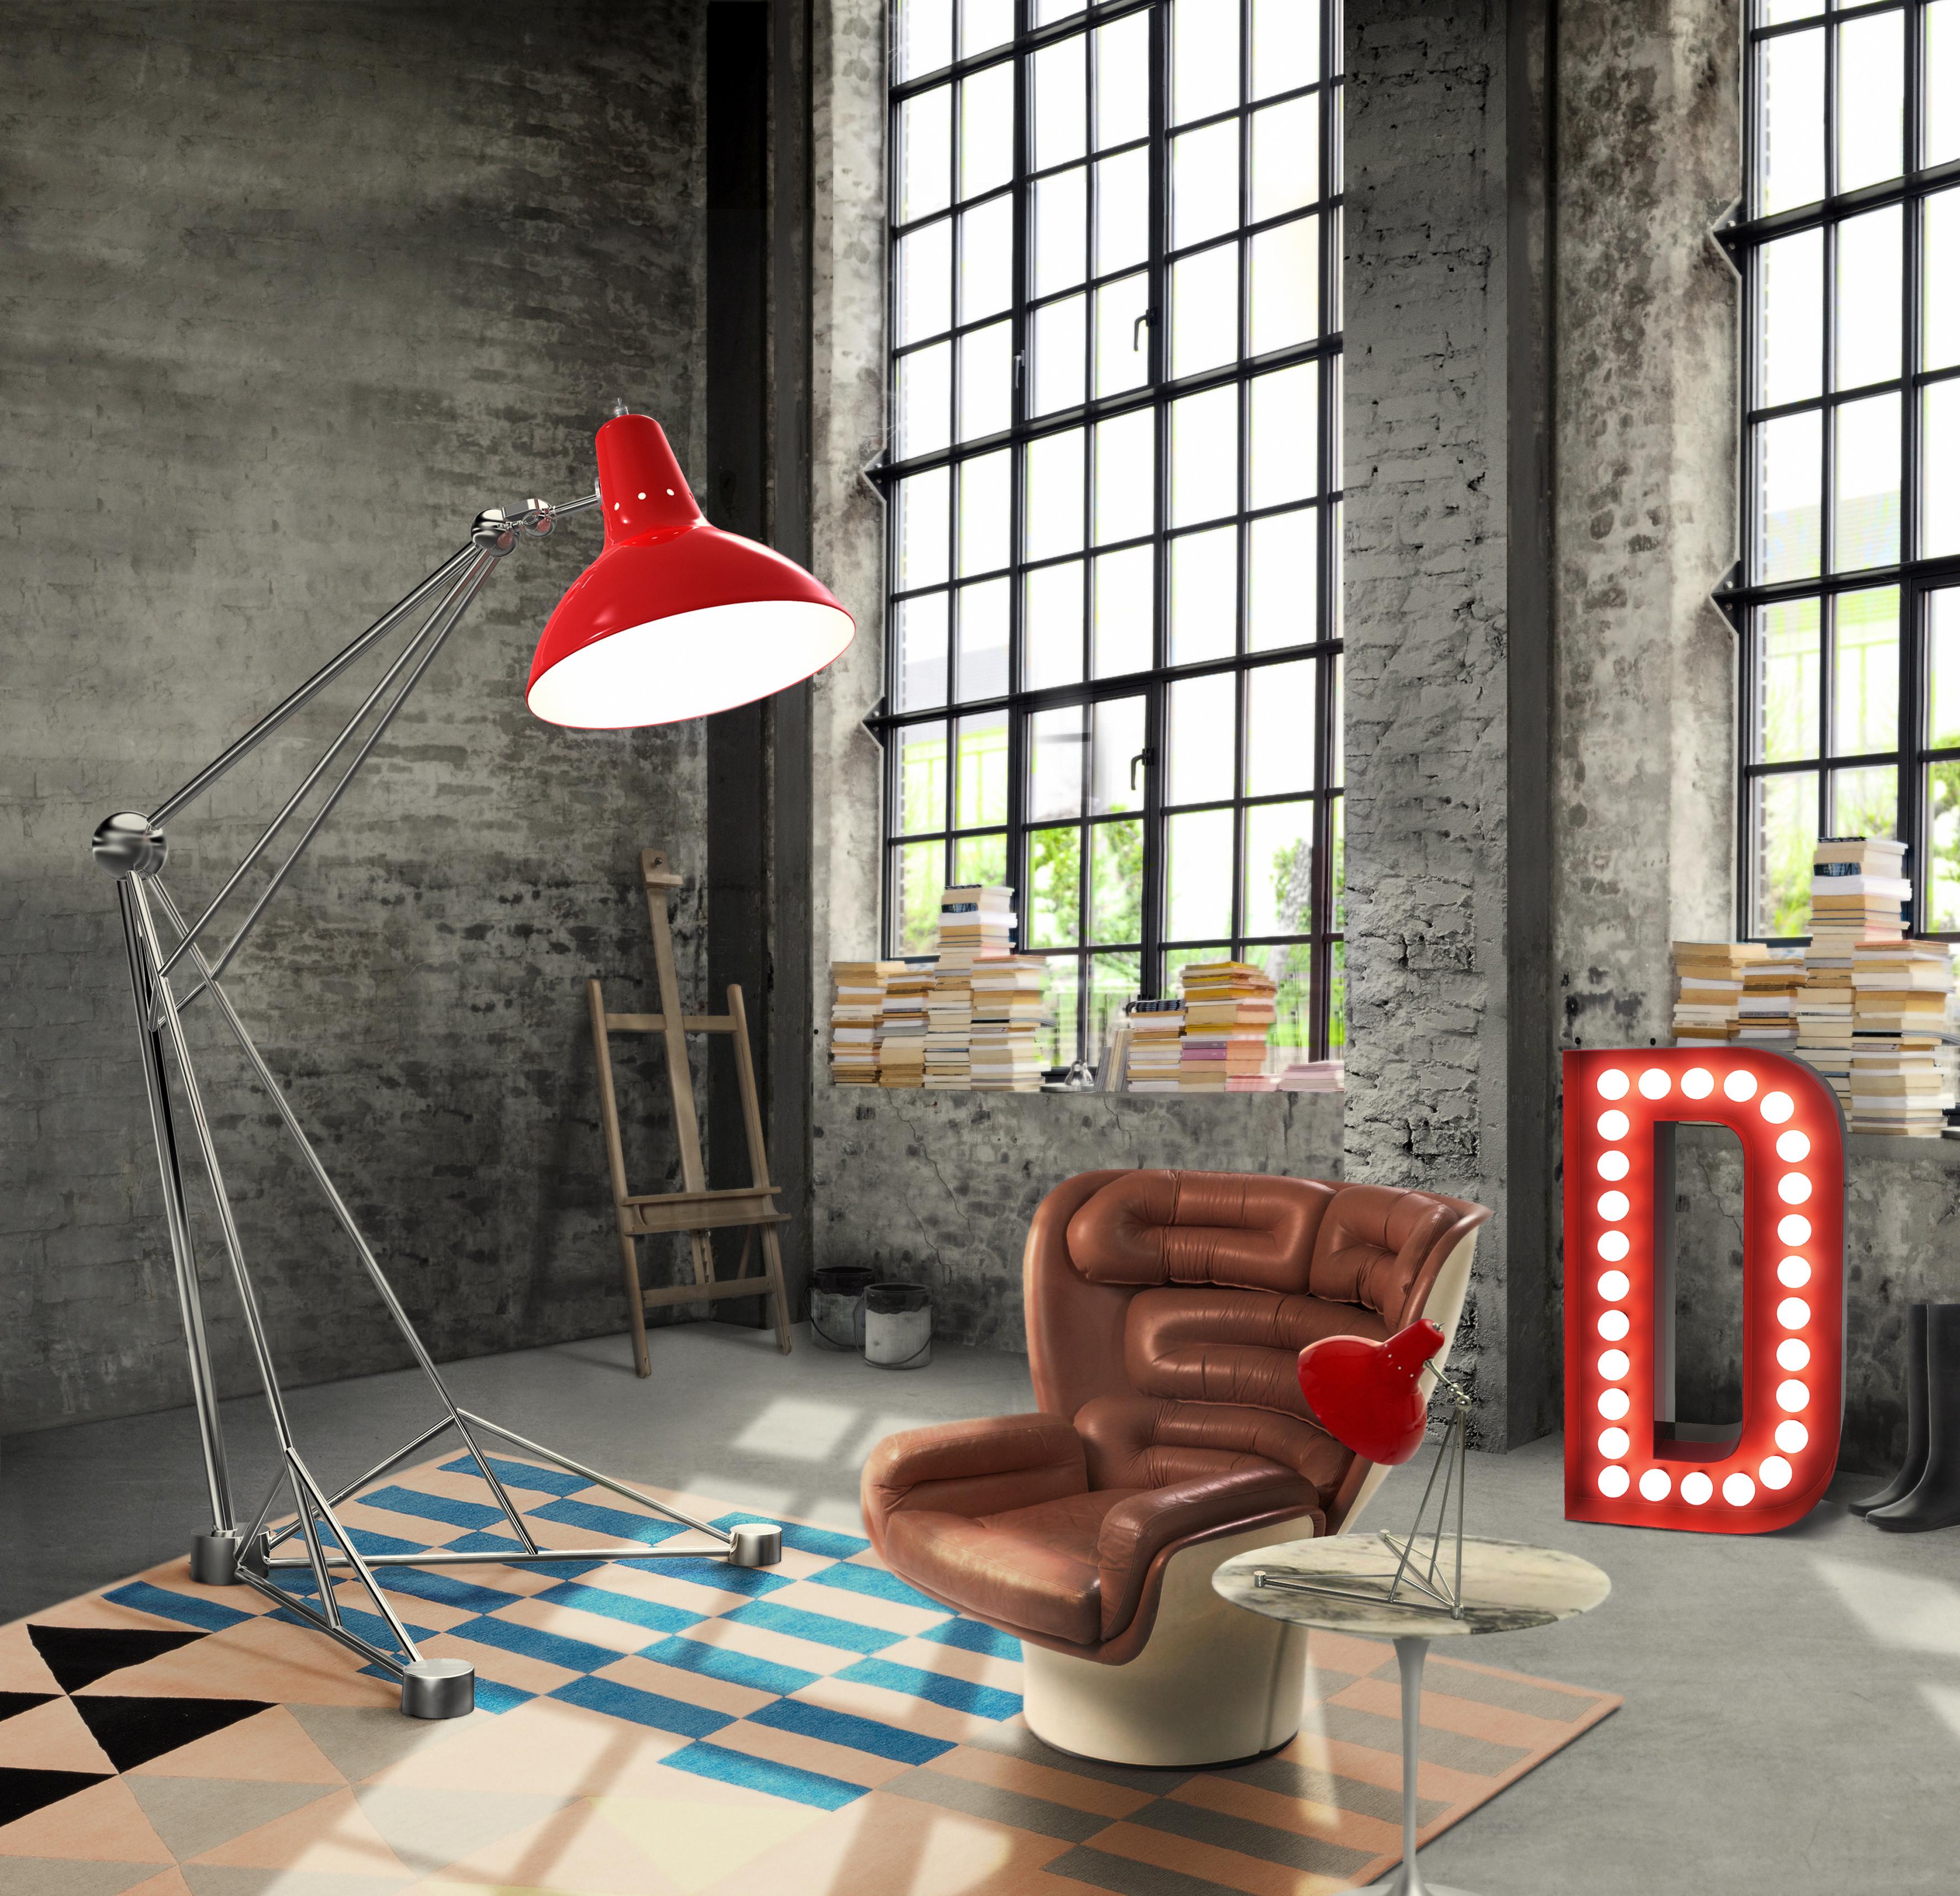 5 Brilliant Ways To Use Industrial Lighting Design